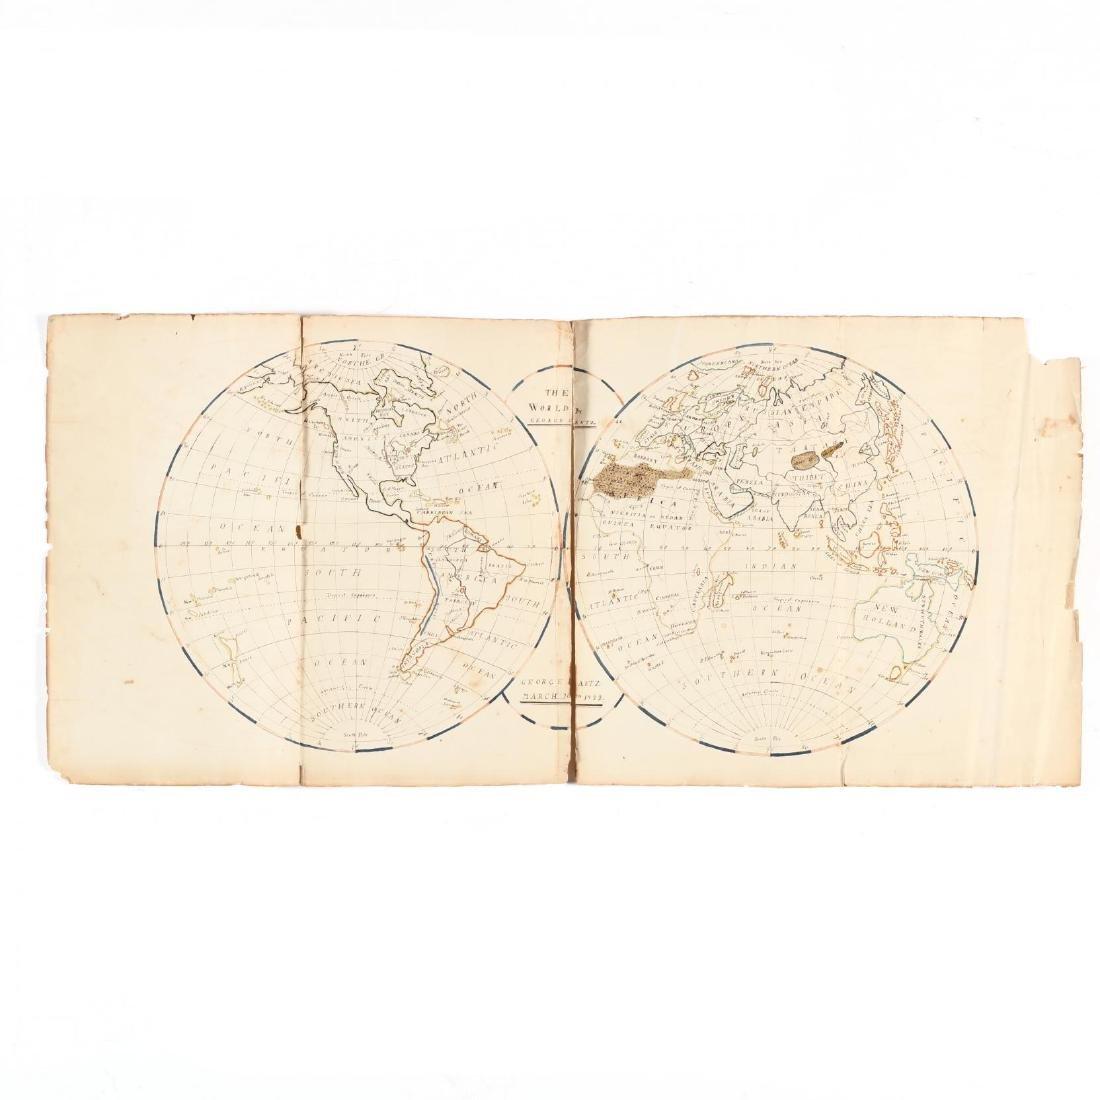 Schoolboy's Calligraphy Double-Hemisphere Map